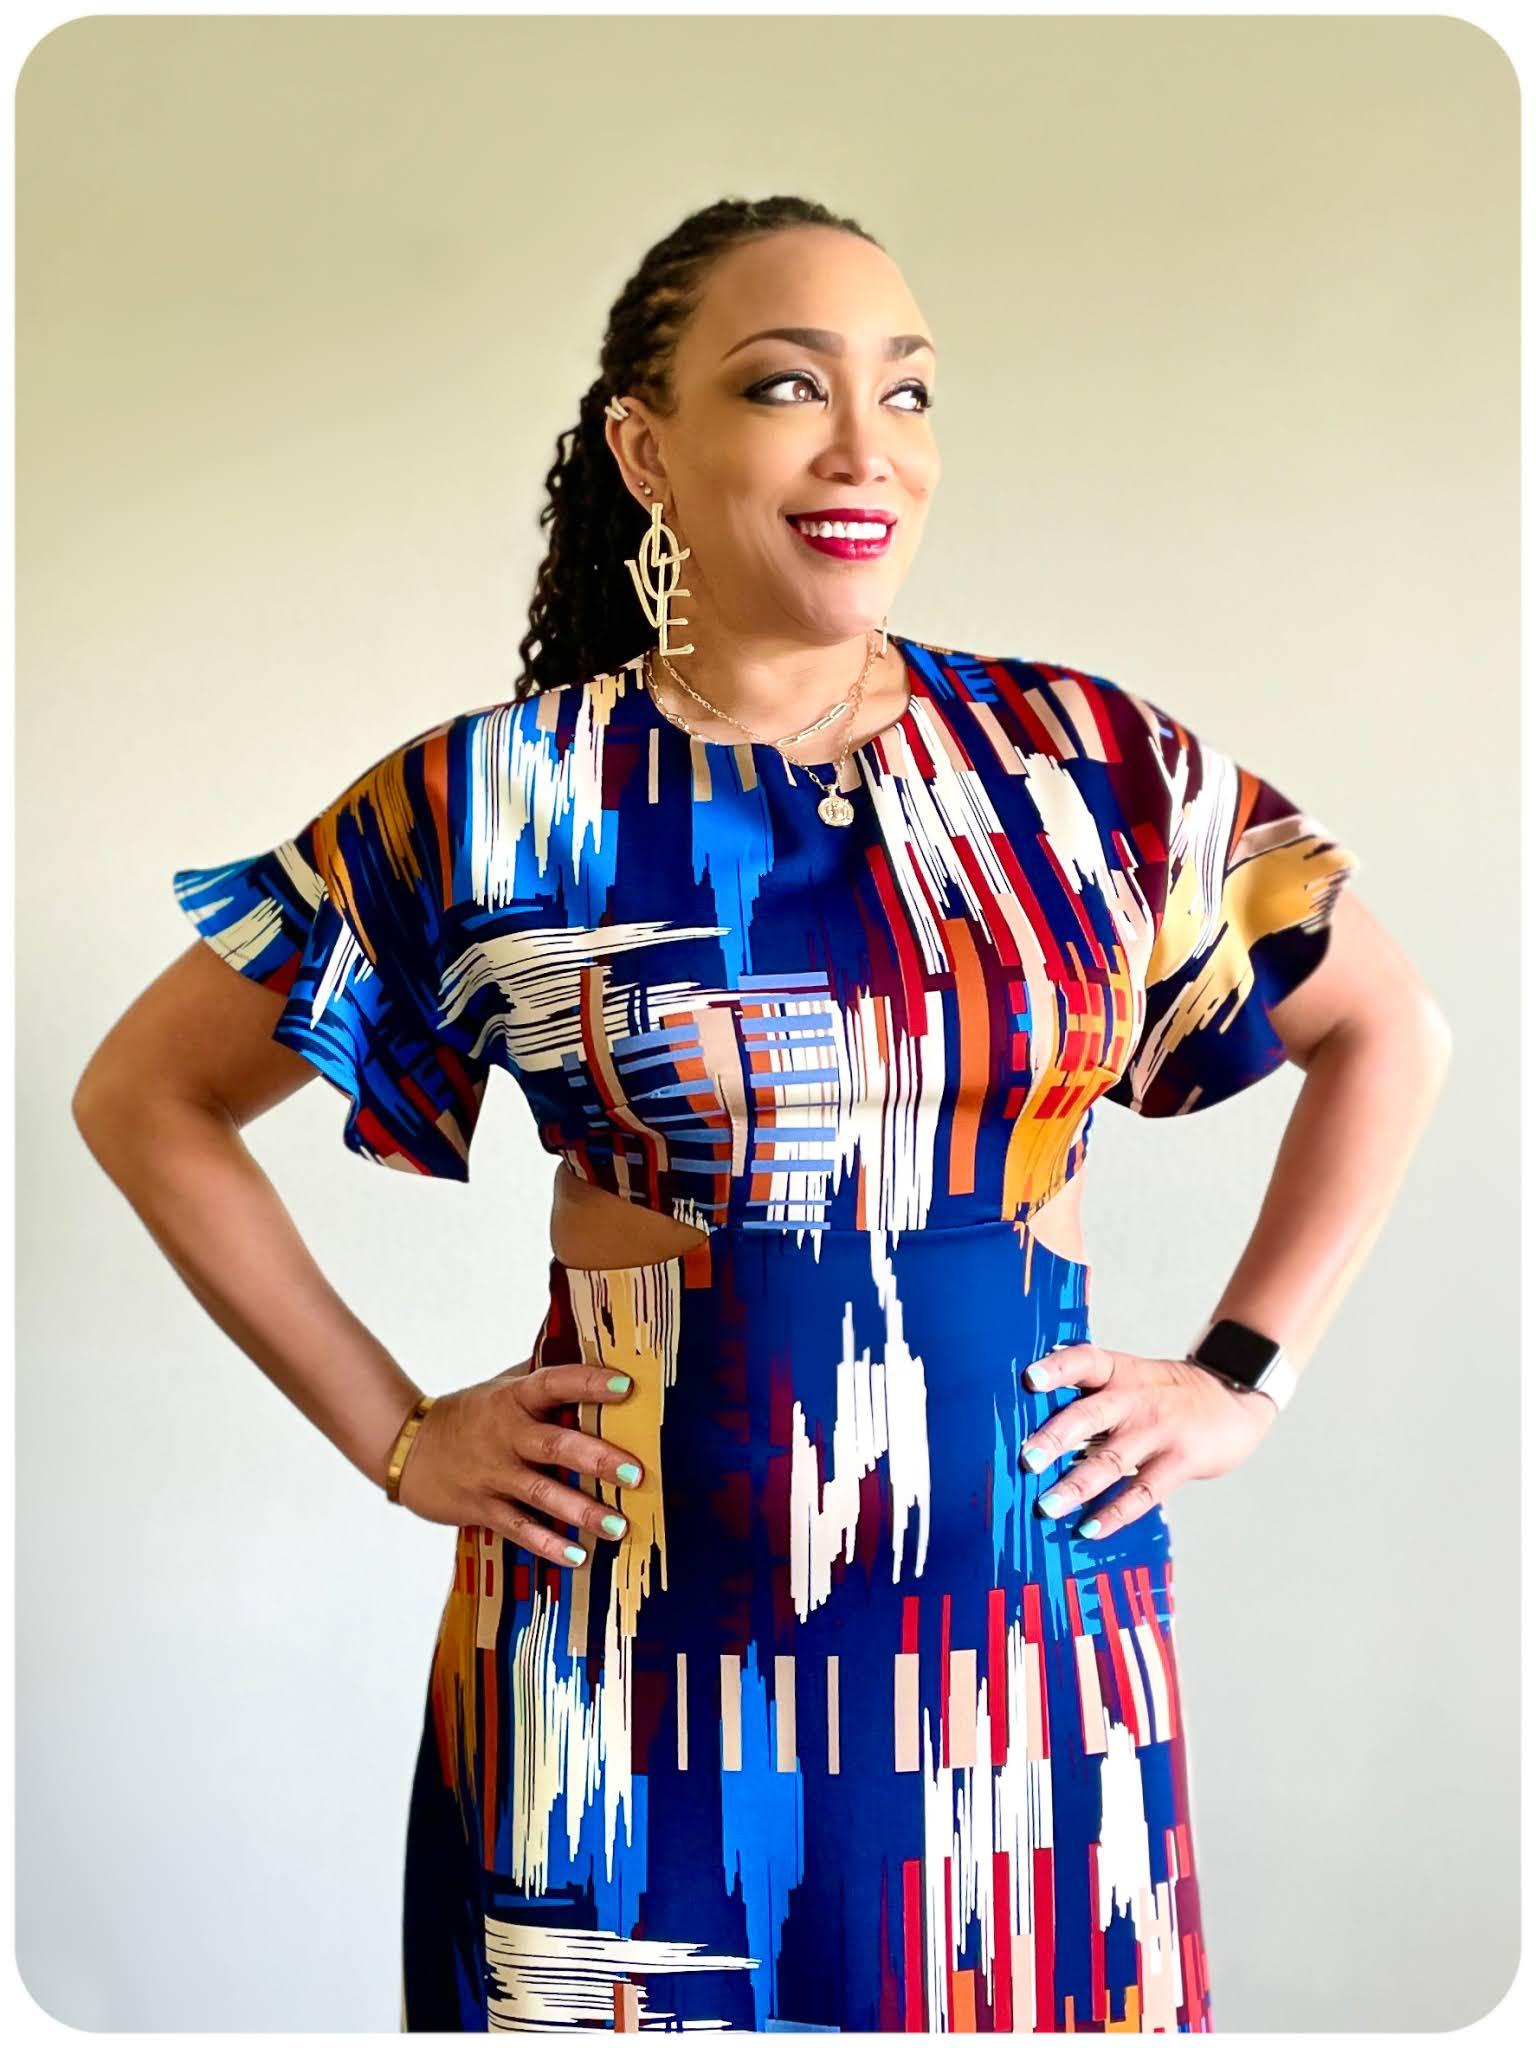 McCall's 8175 - Erica Bunker DIY Style x Zelouf Fabrics